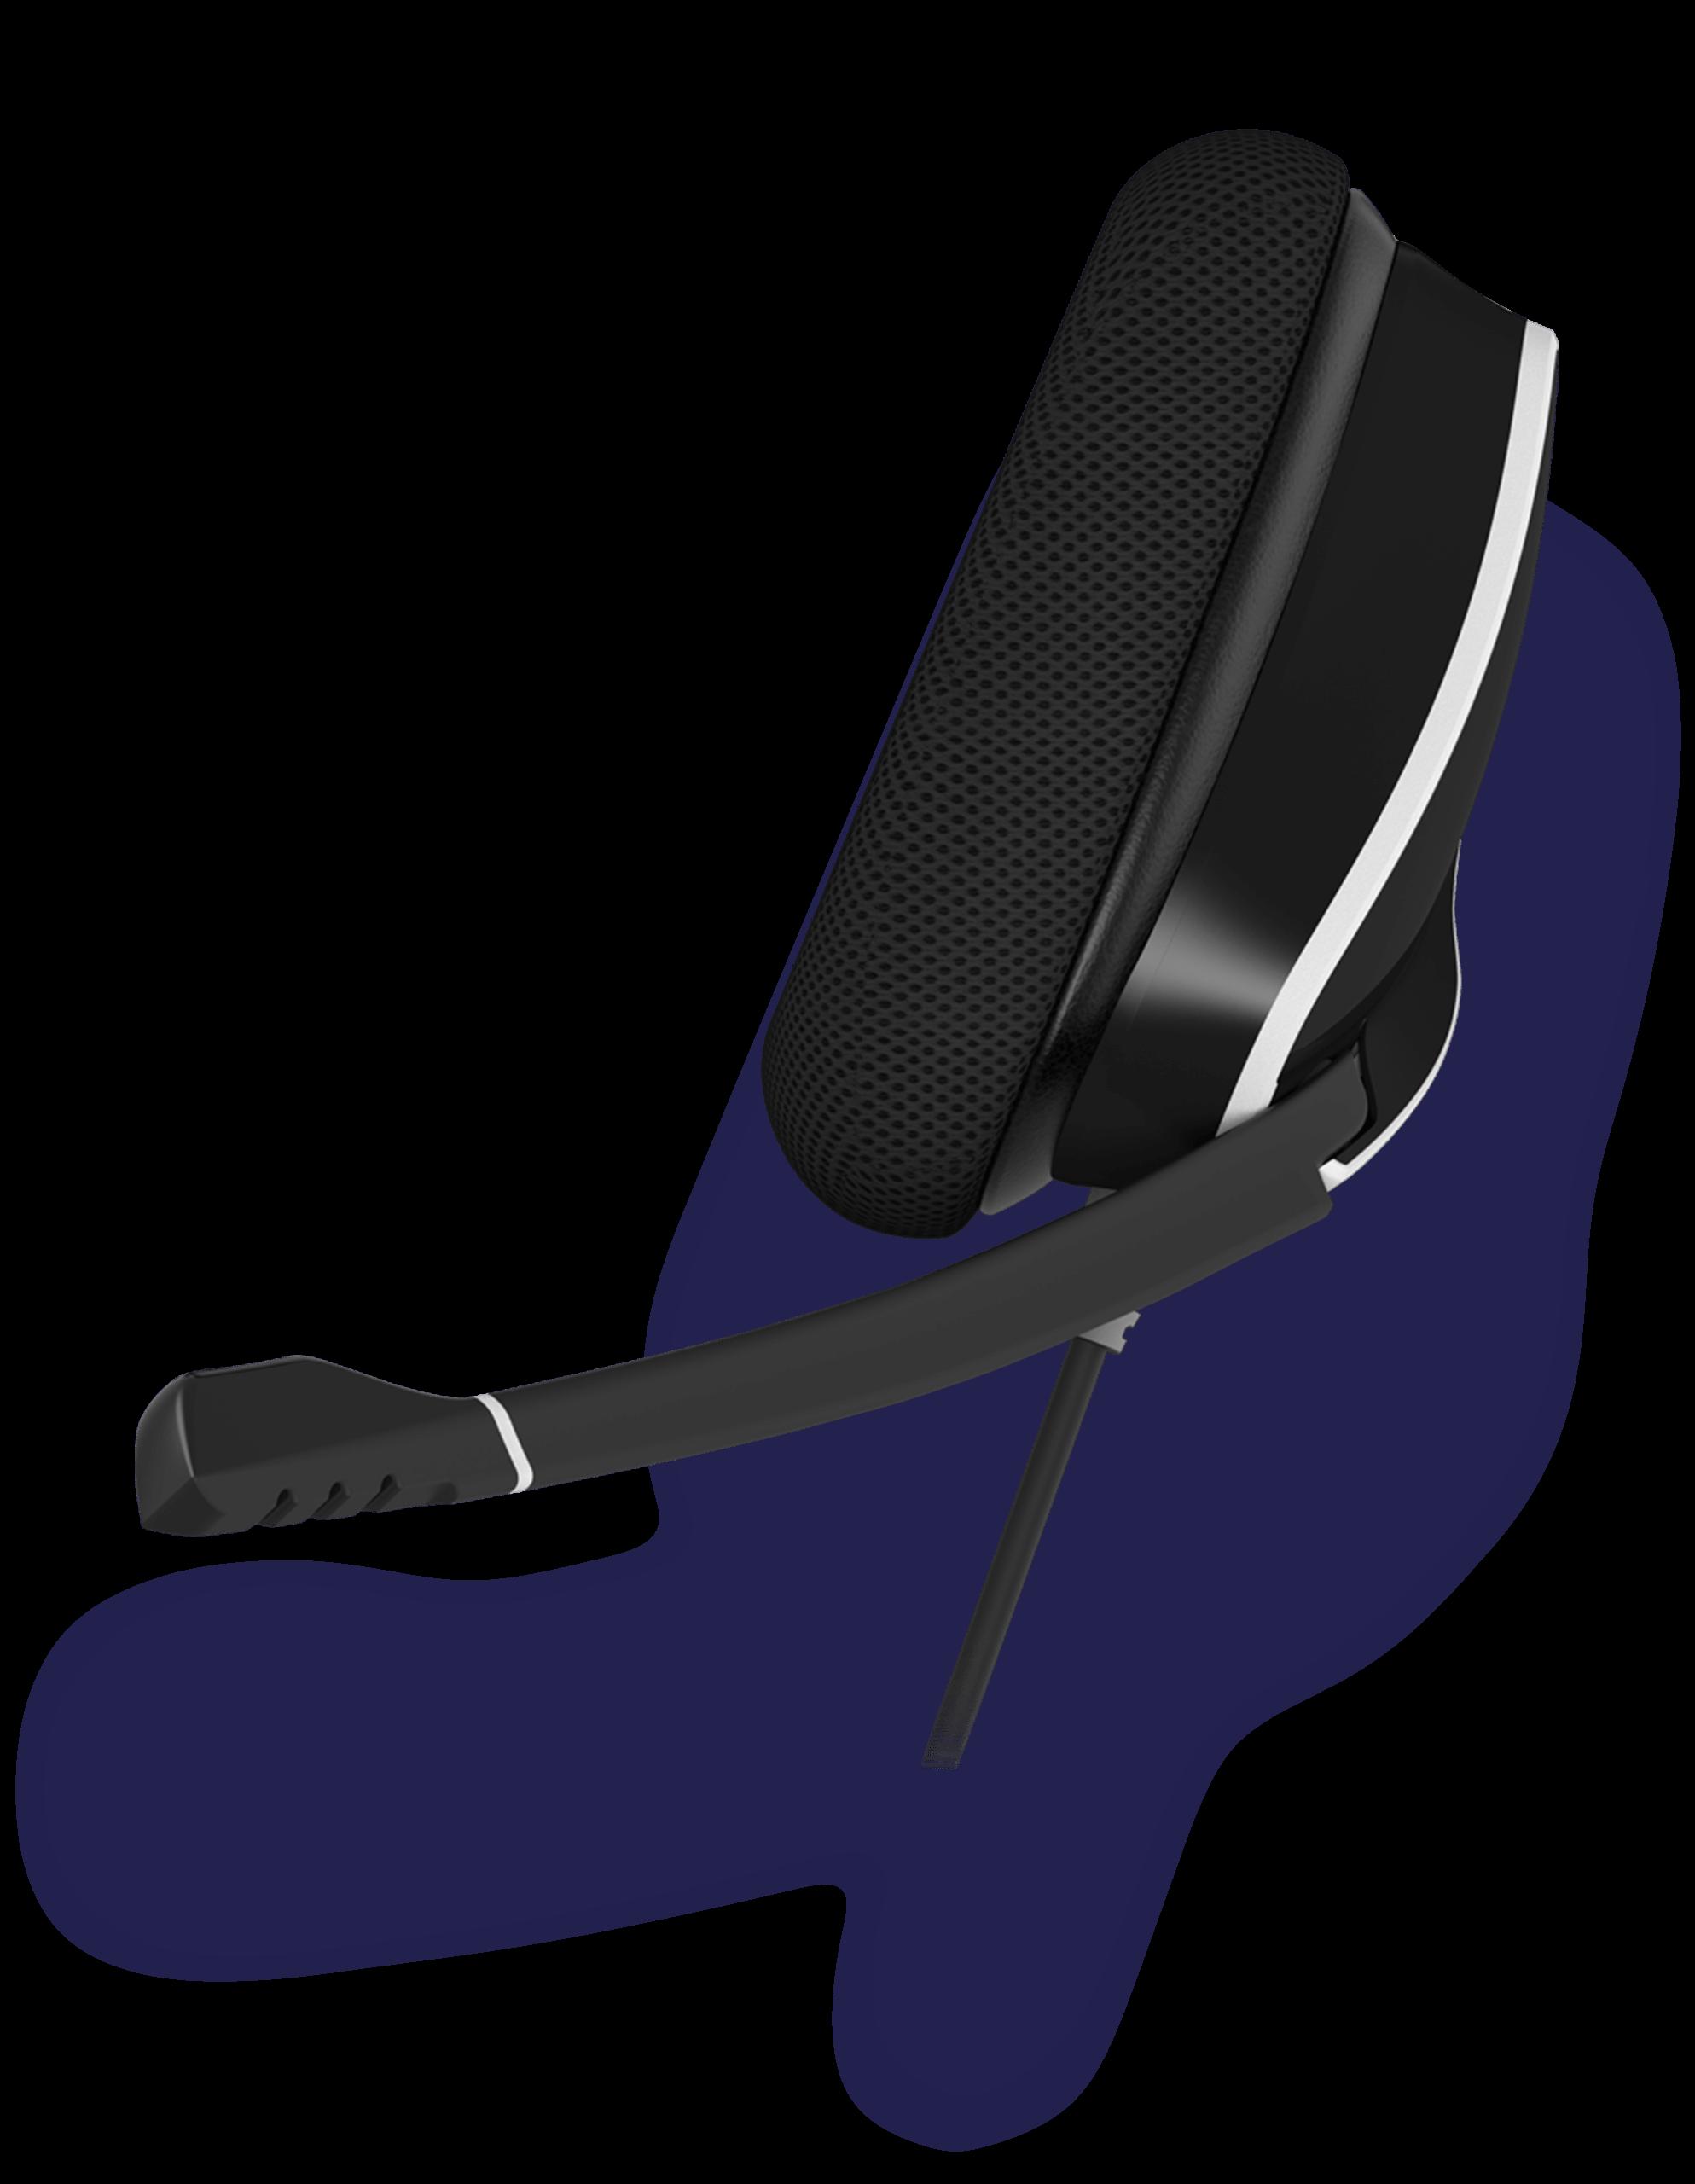 Corsair VOID RGB ELITE USB Premium Gaming Headset with 7.1 Surround Sound — White 22